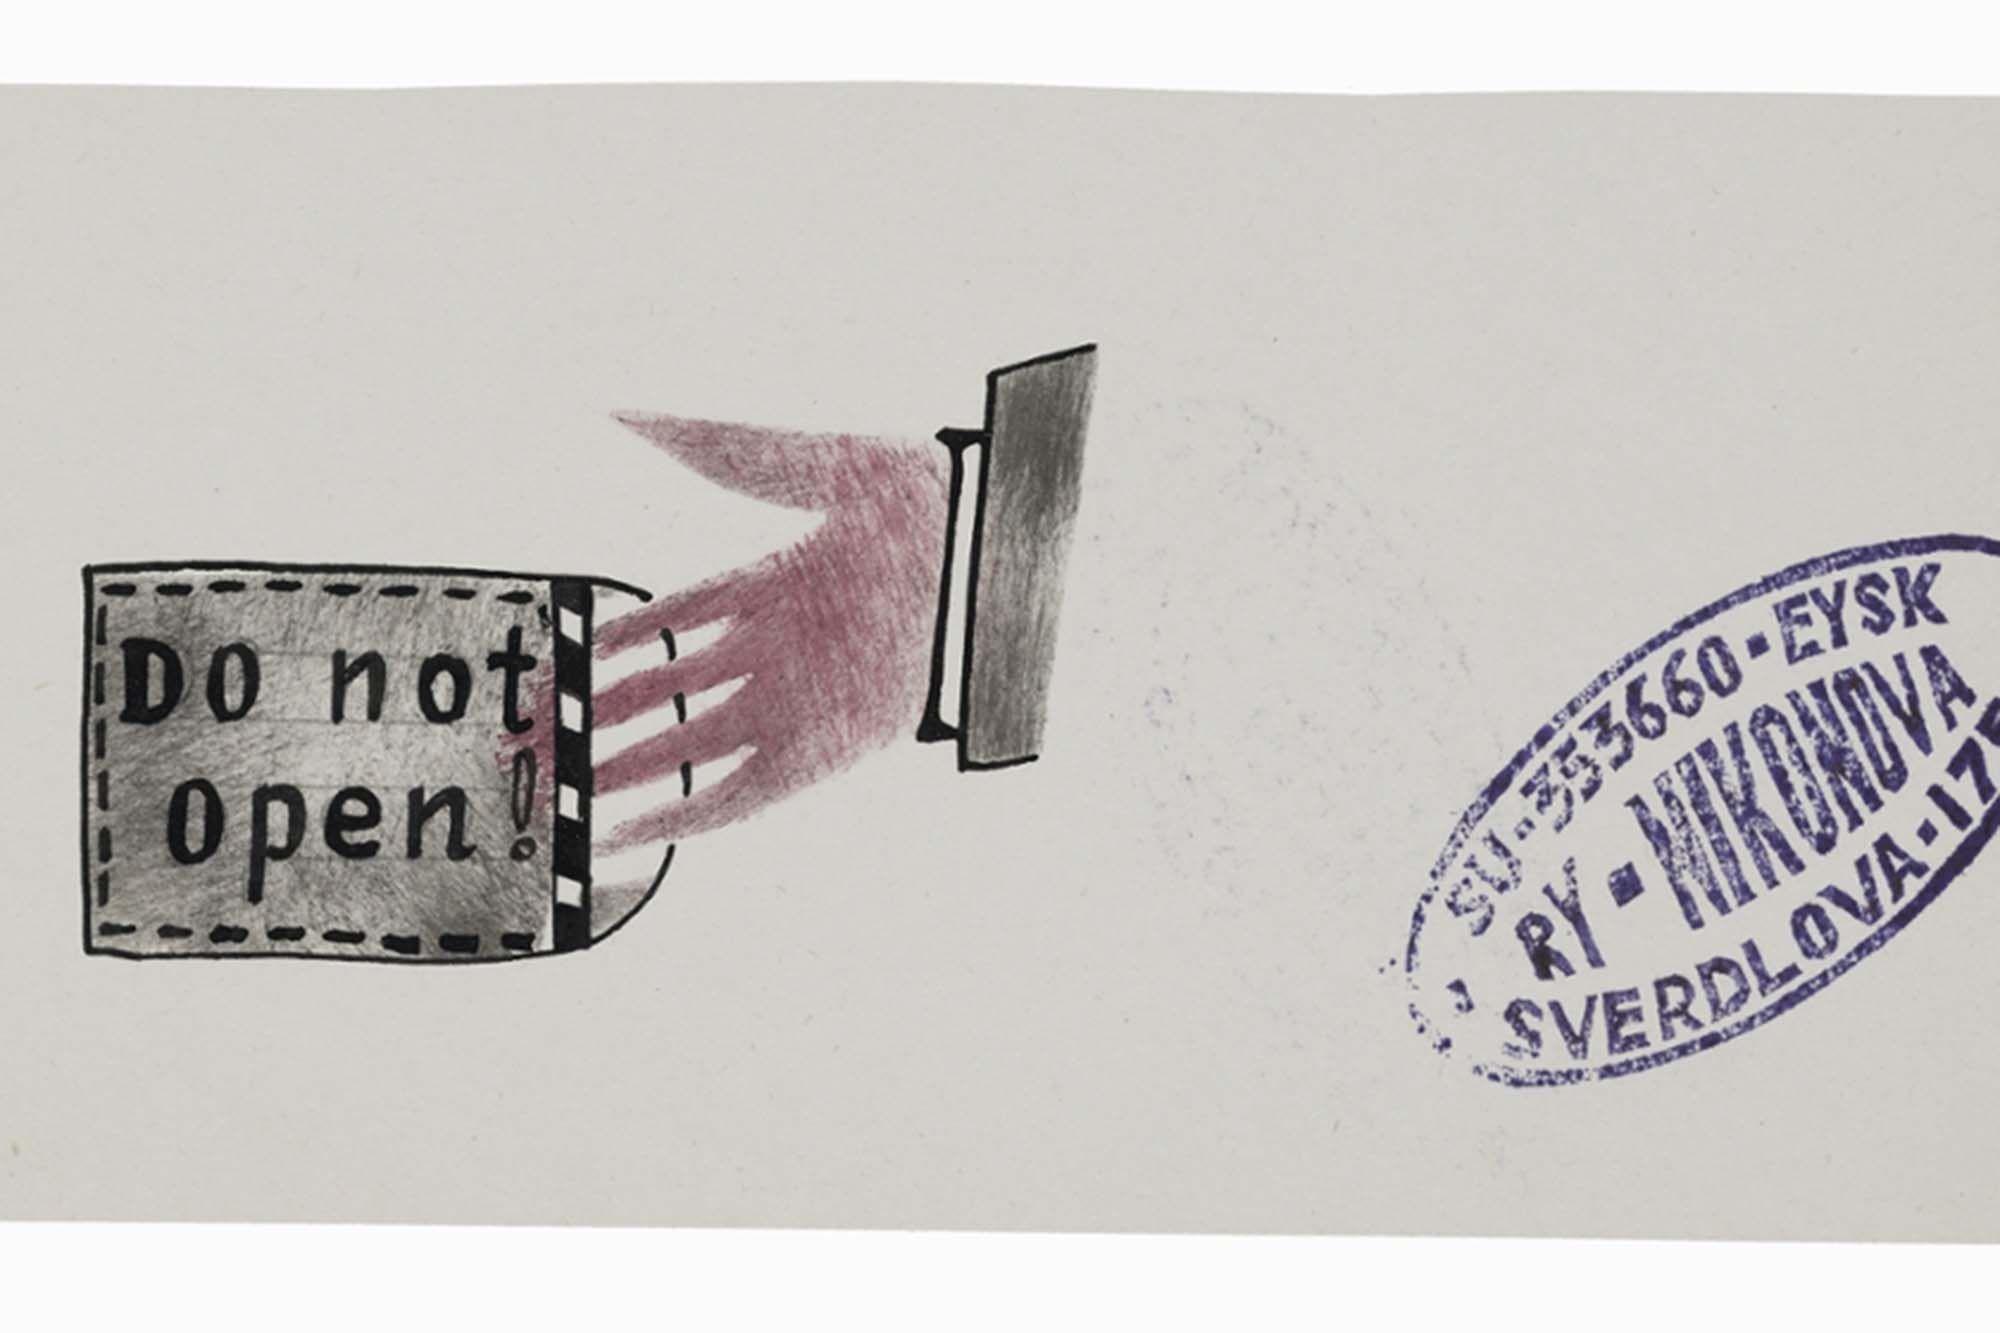 Ry Nikonova, Mail art to John Held Jr., 1988, John Held papers relating to Mail Art